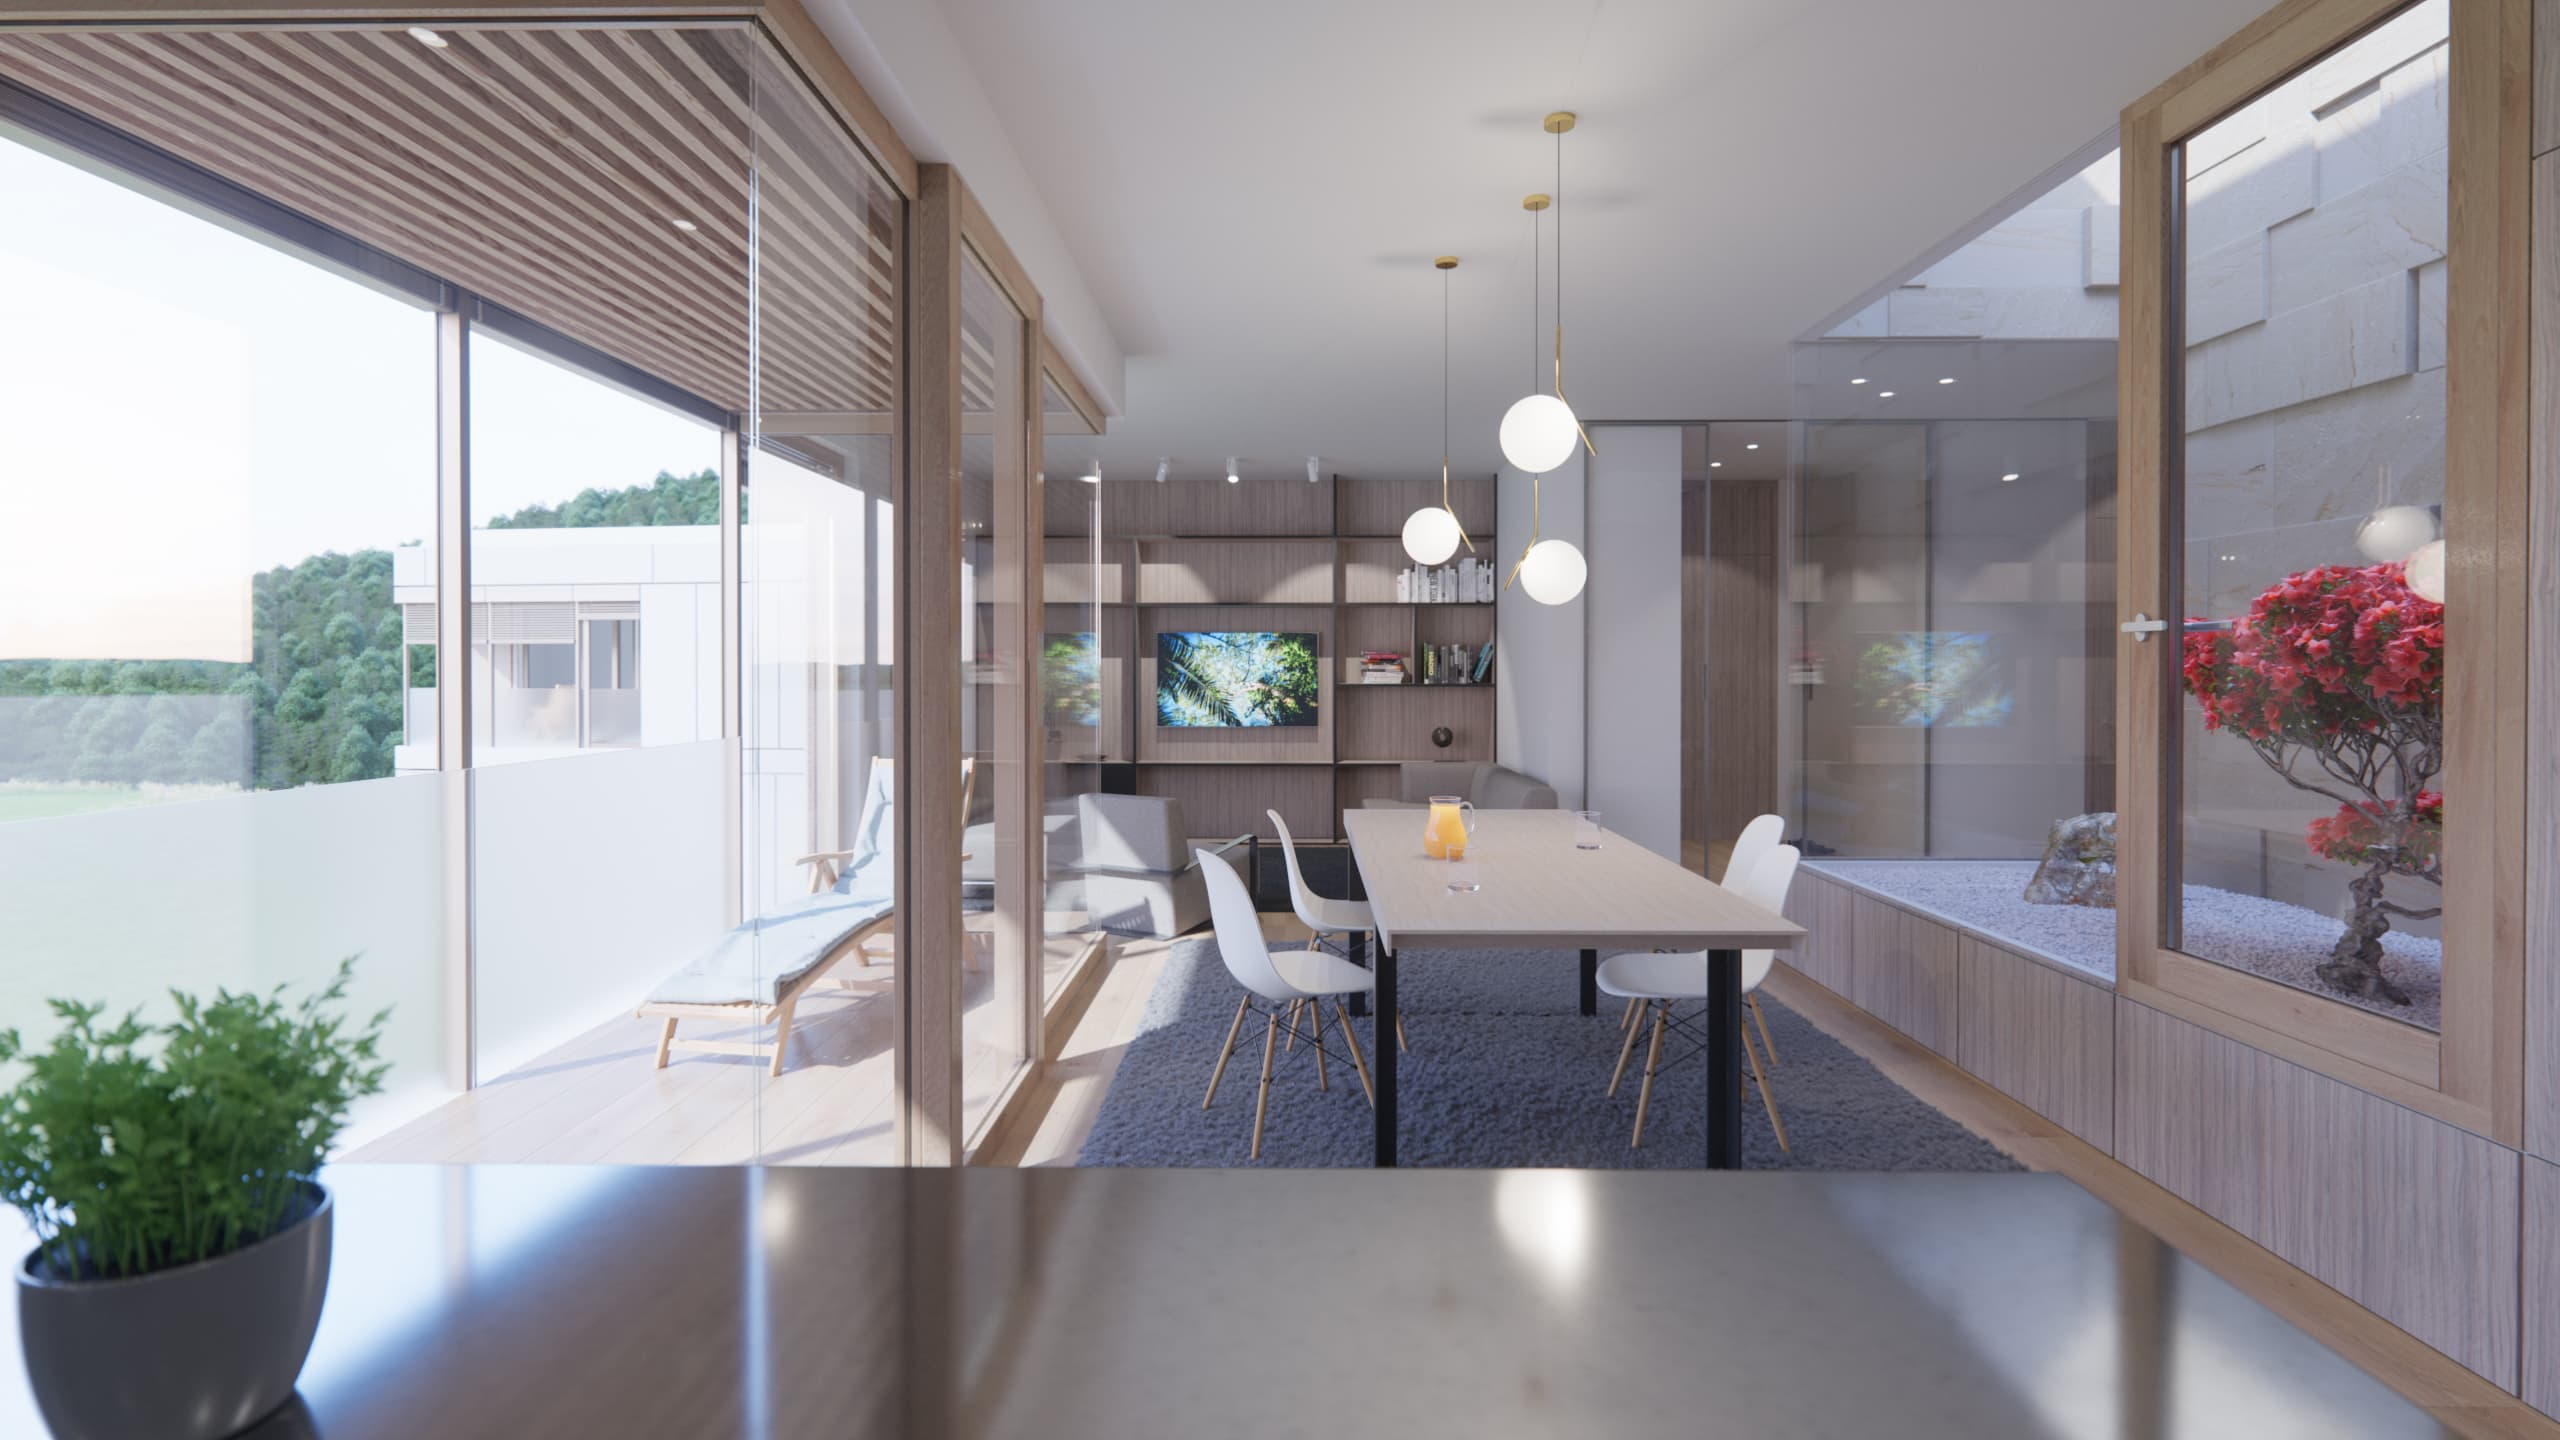 Ekorna_interior_1